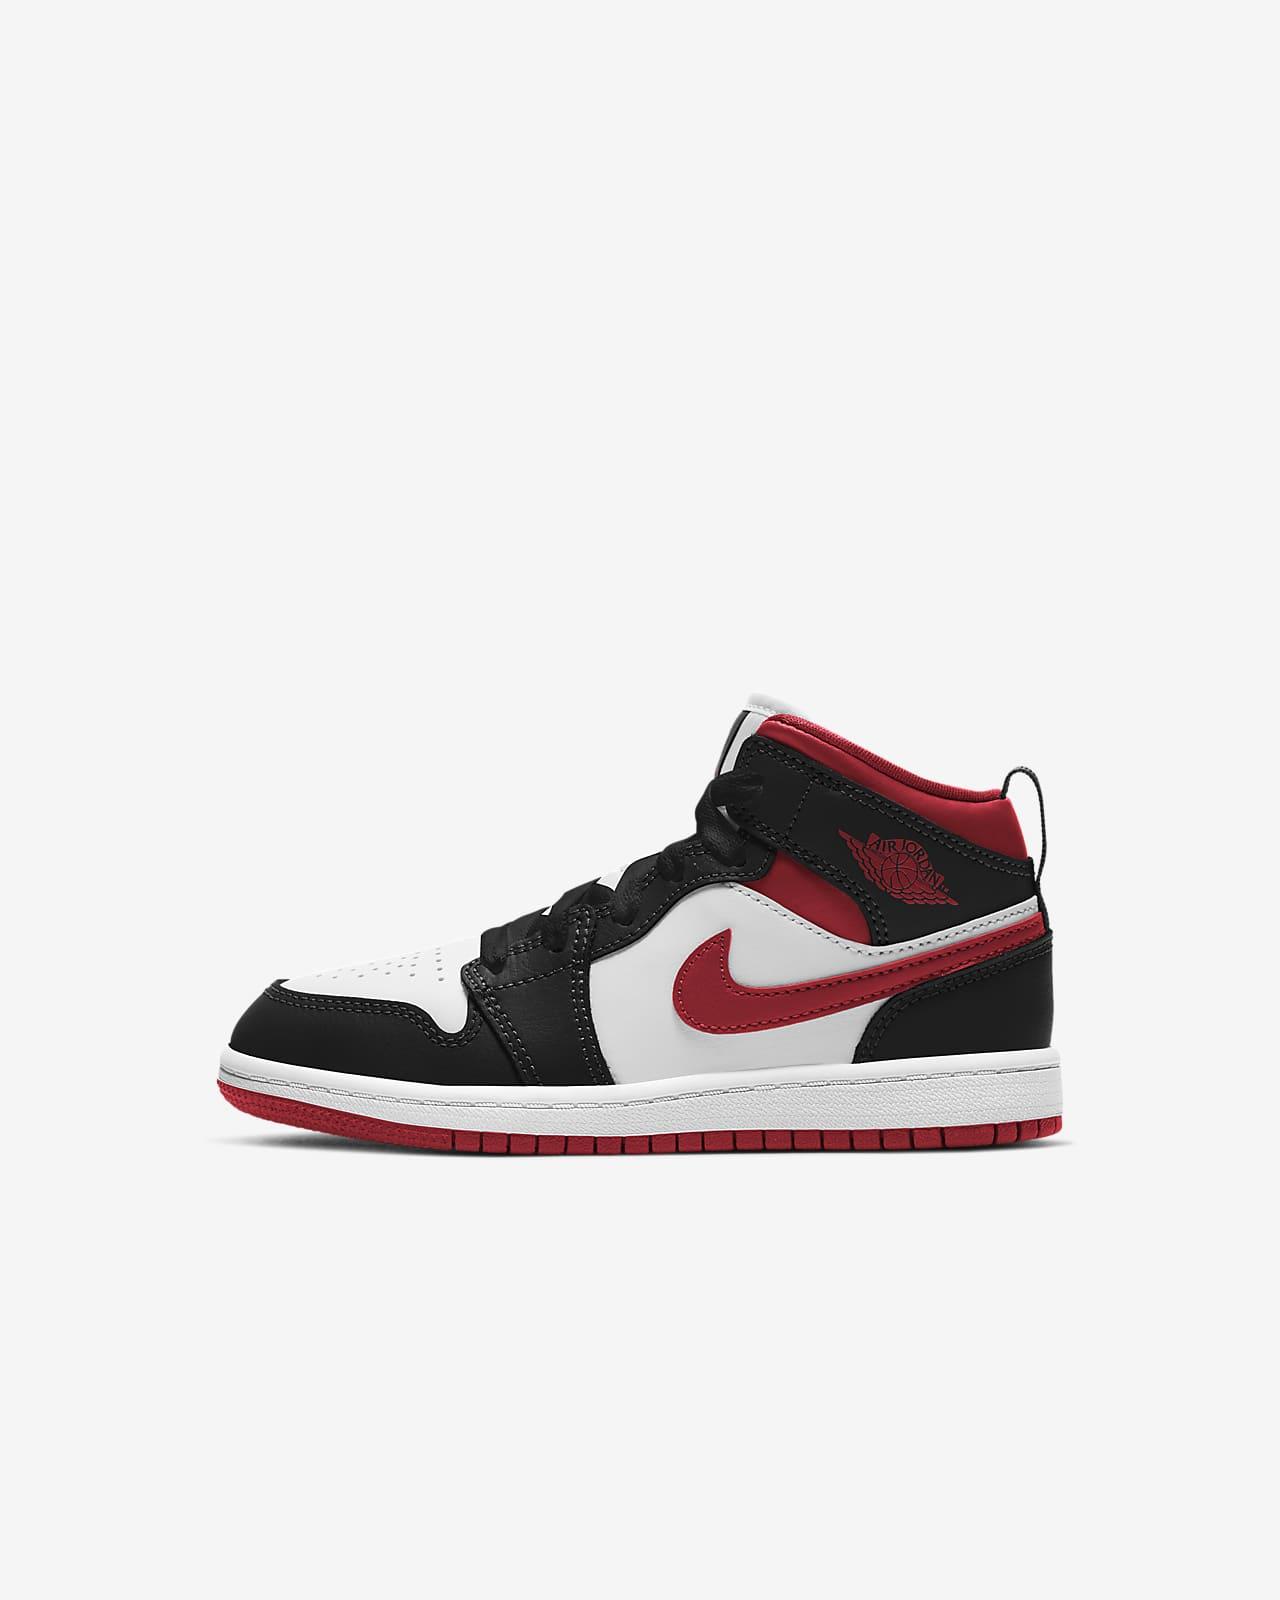 Jordan 1 Mid Schuh für jüngere Kinder